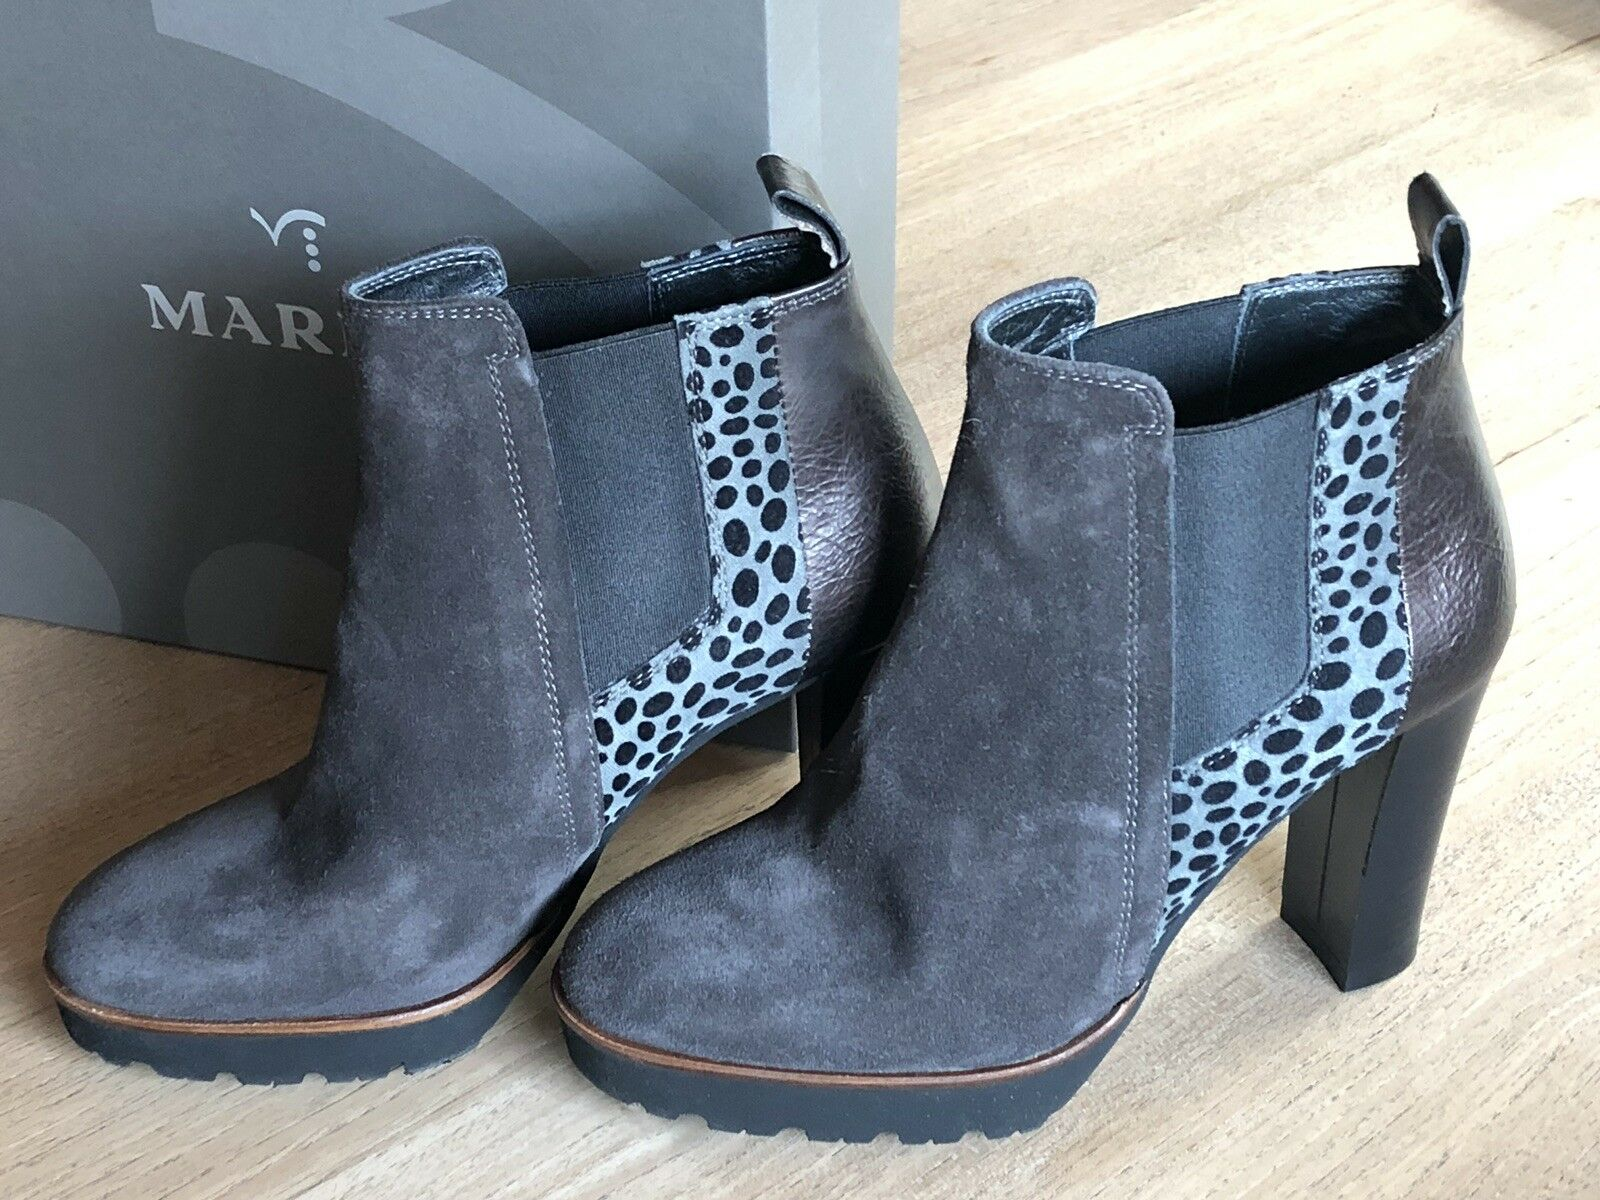 Maripé Stiefeletten Damen Schuhe Echtleder grau   metallic   Leo Gr. 37 NEU